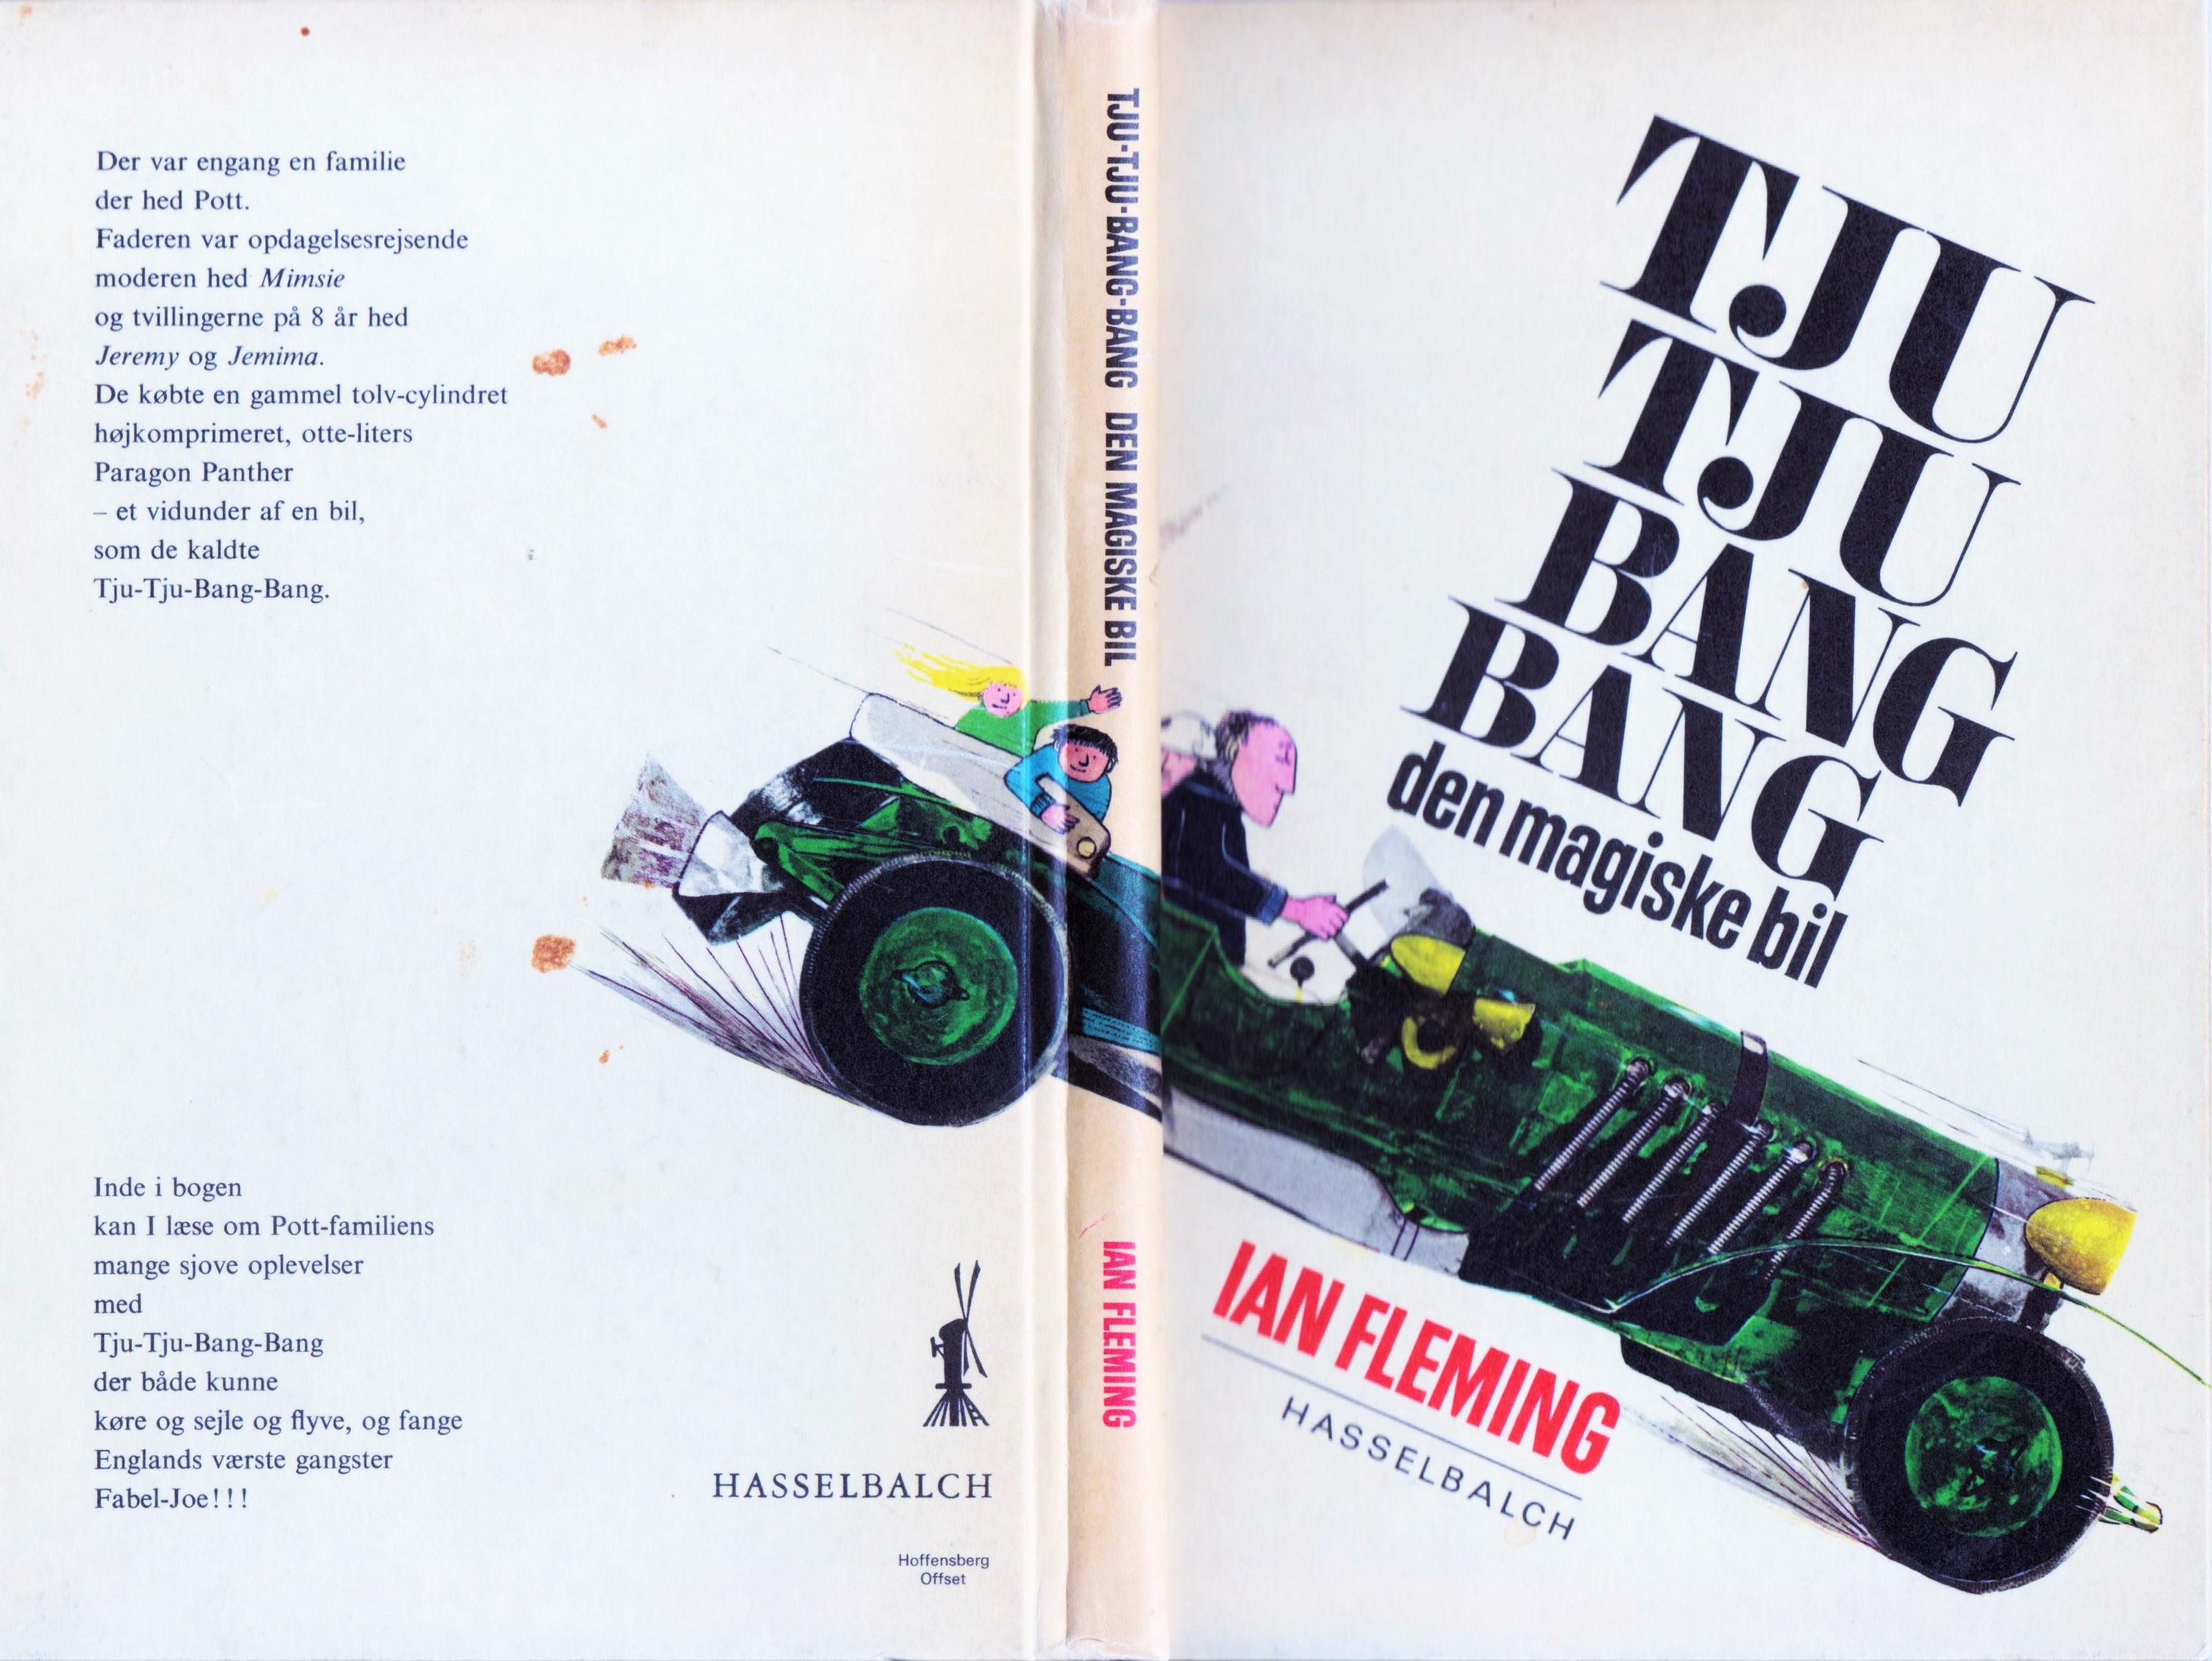 Tju-tju-bang-bang DK 1966 cover